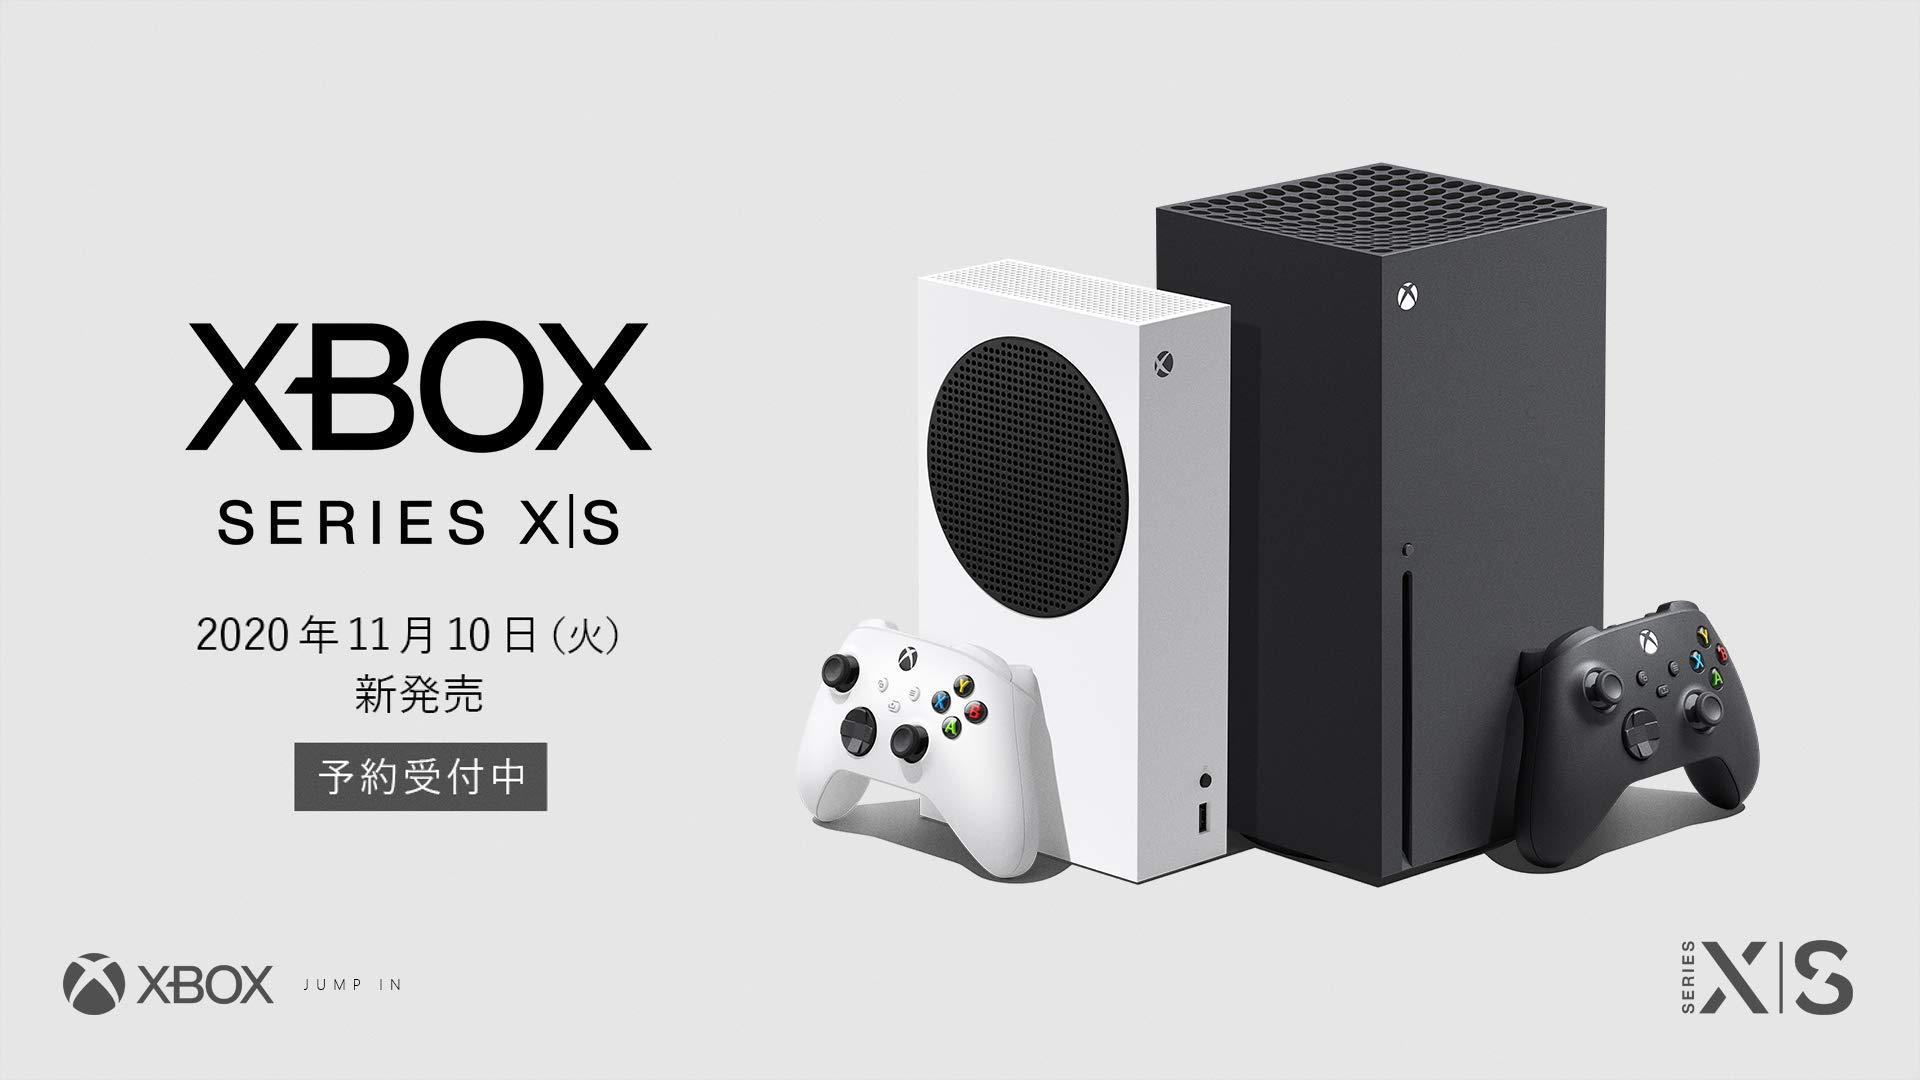 Series XS